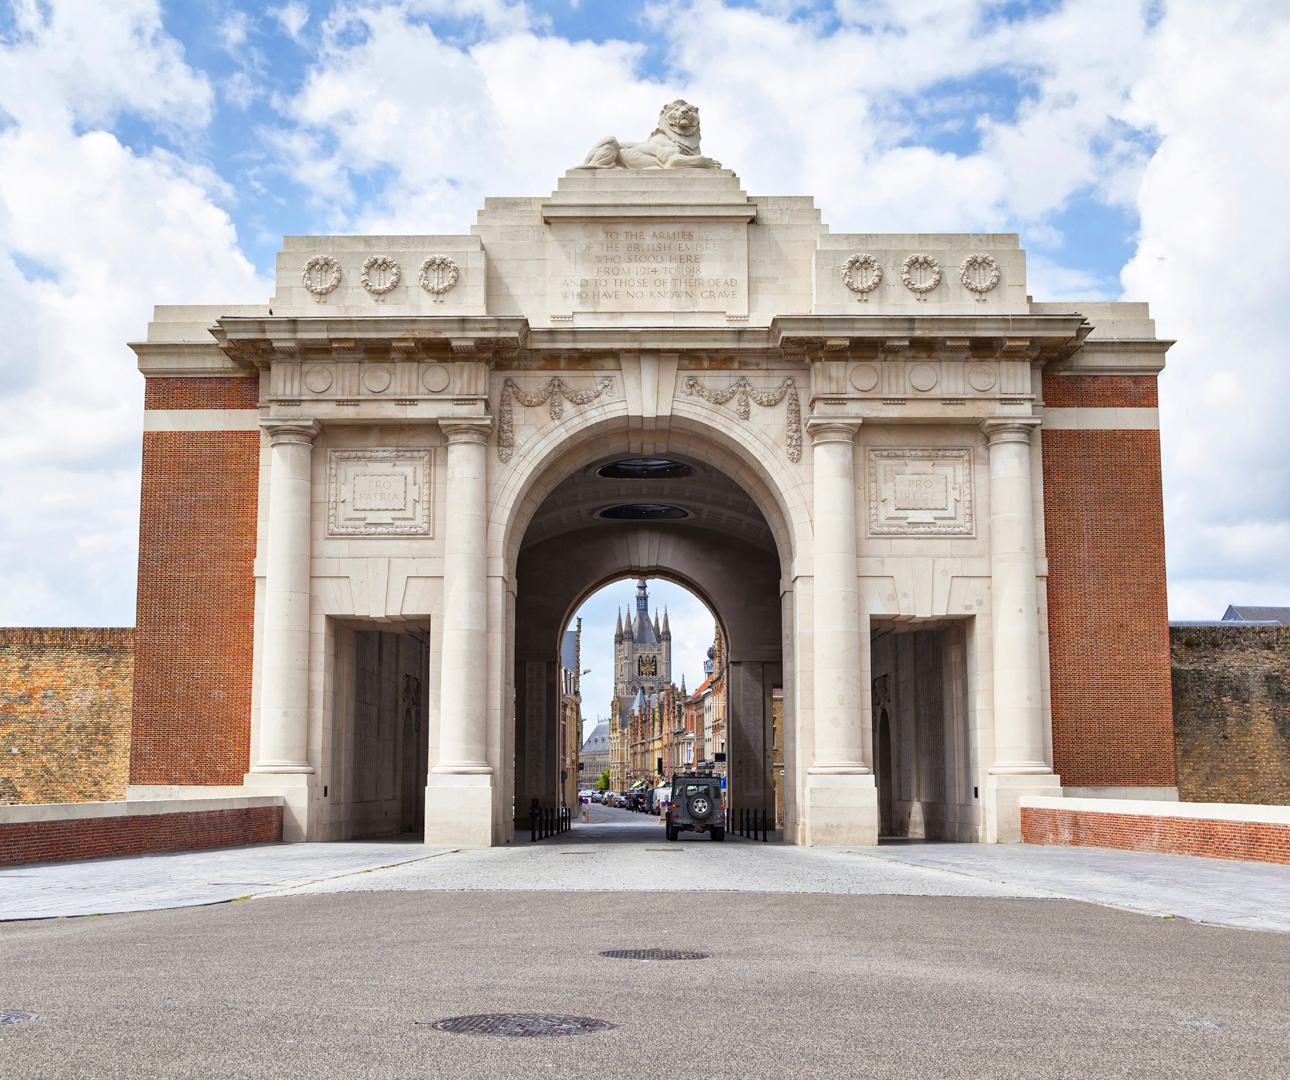 Menin-Gate---World-War-I-memorial-in-Ypres-iStock-bbsferrari-www.istockphoto[1]